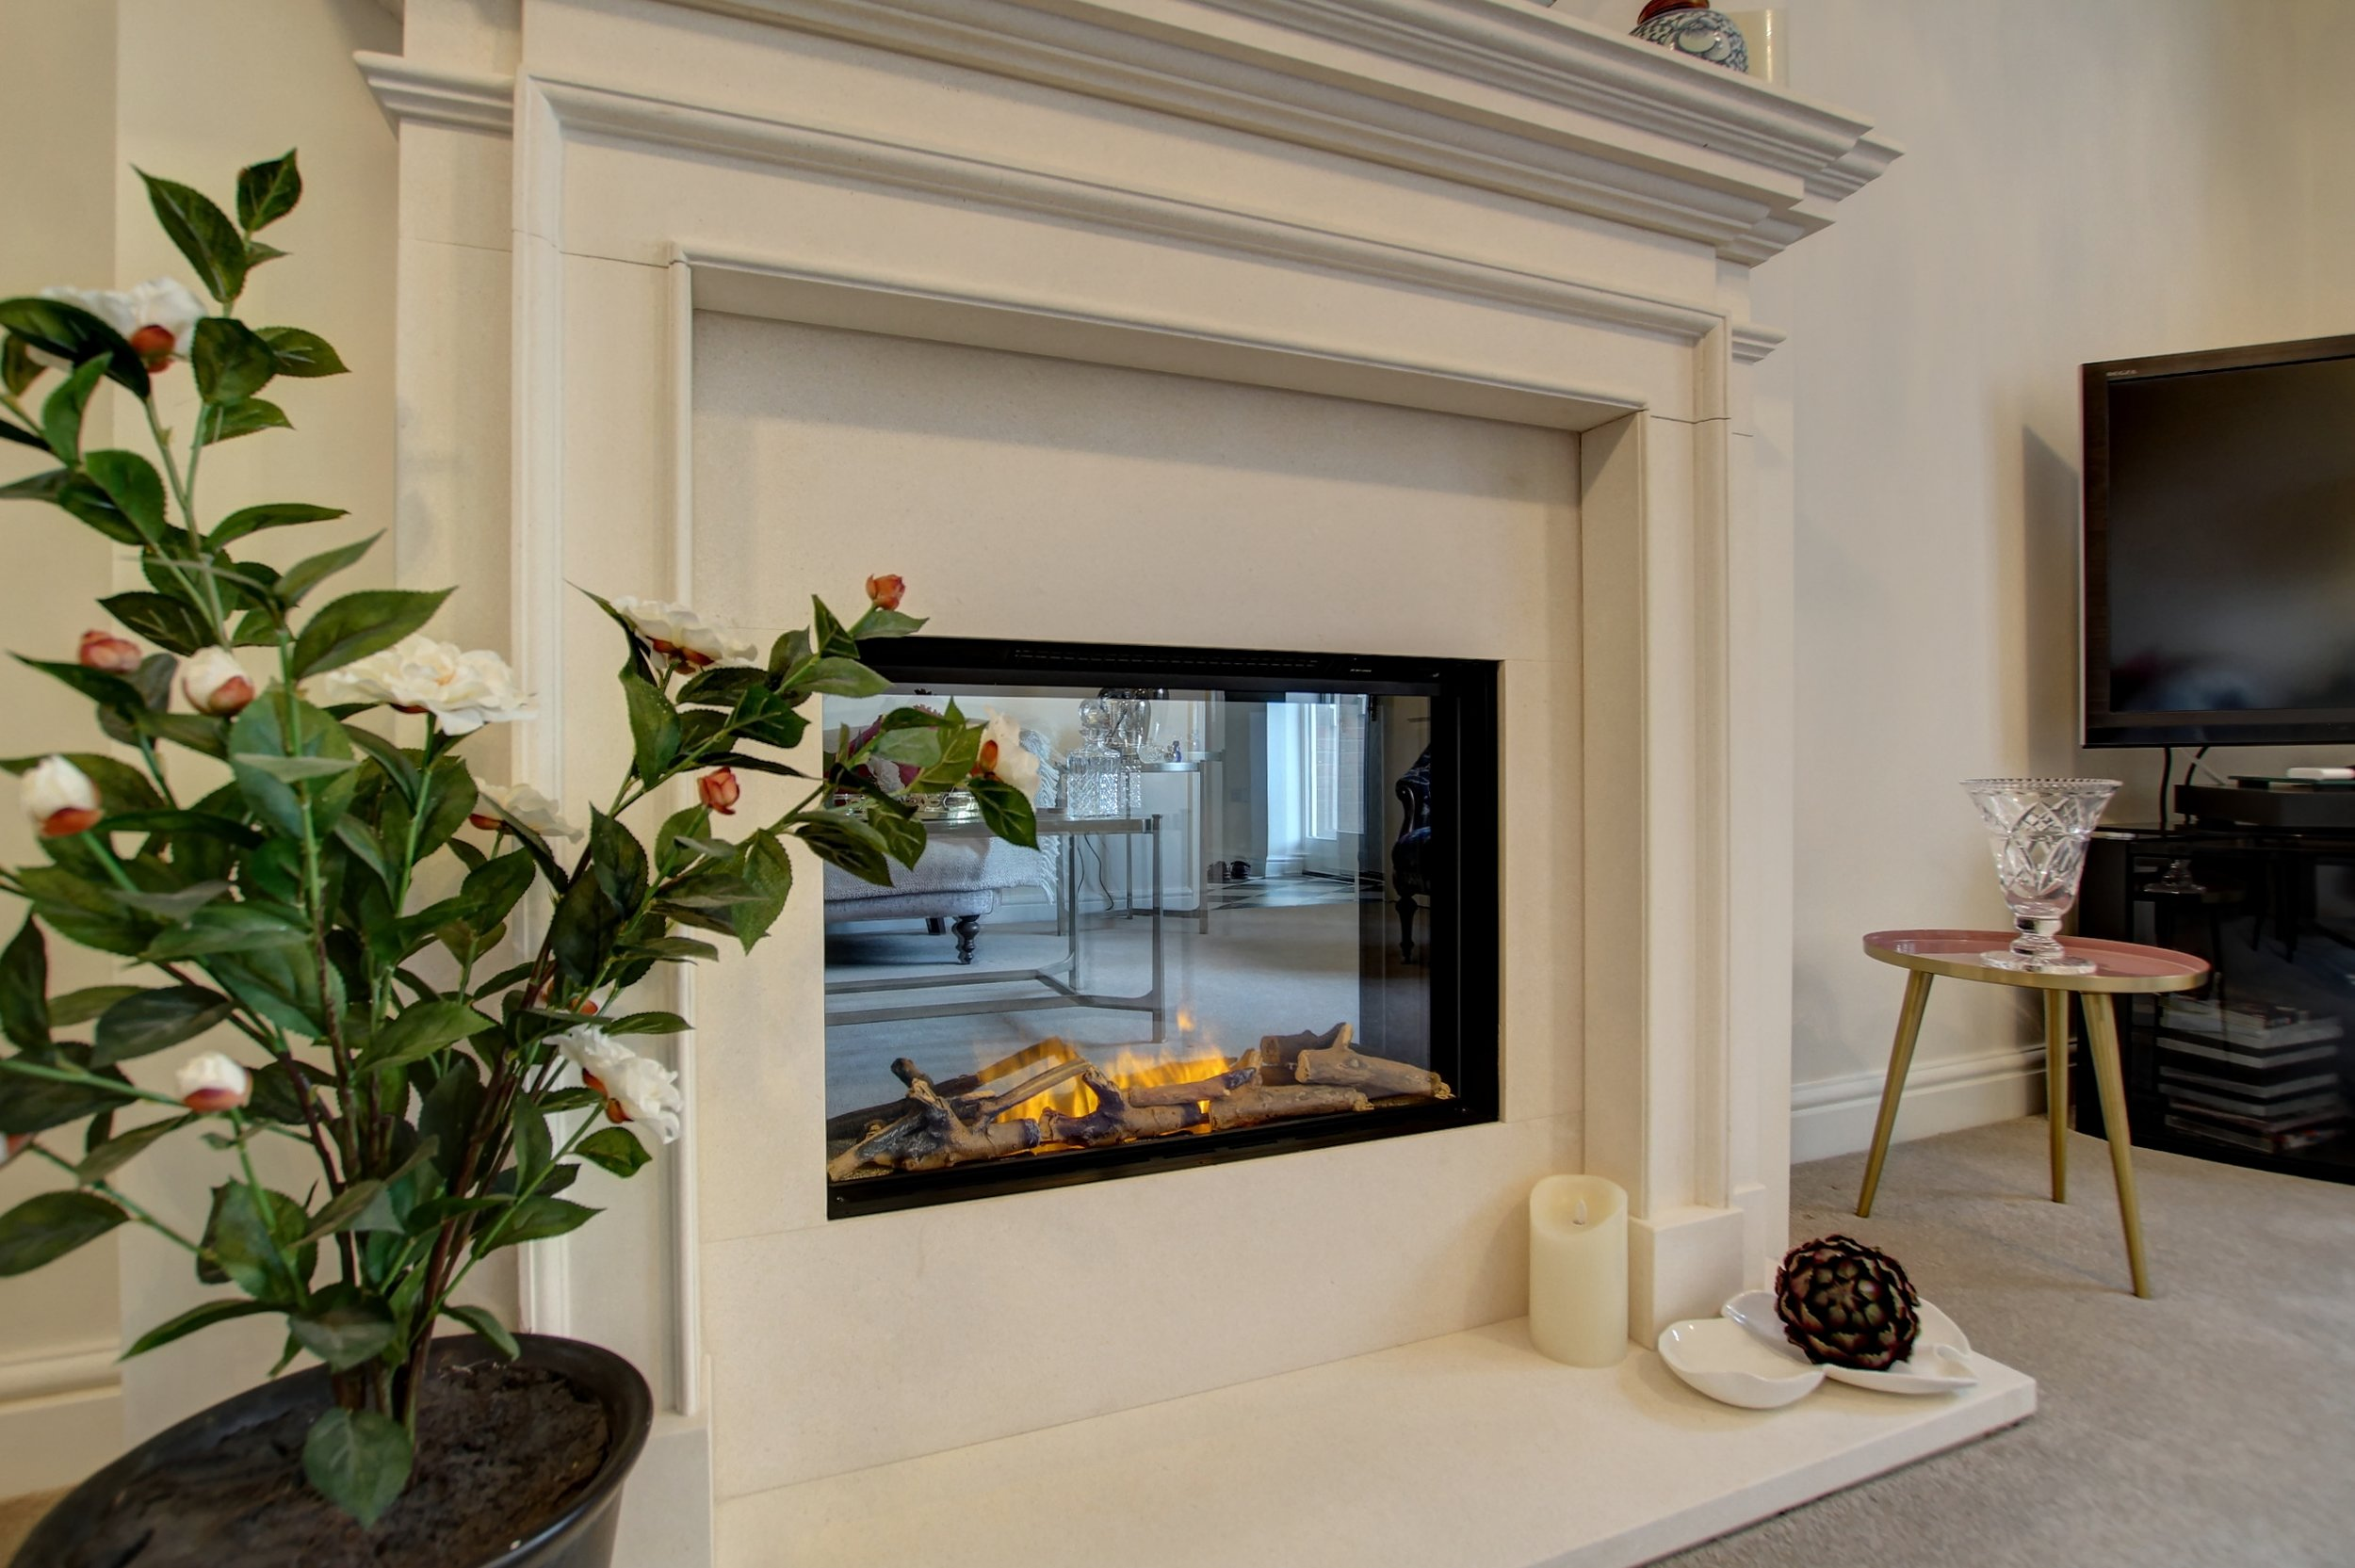 3 fireplace lifestyle.jpg